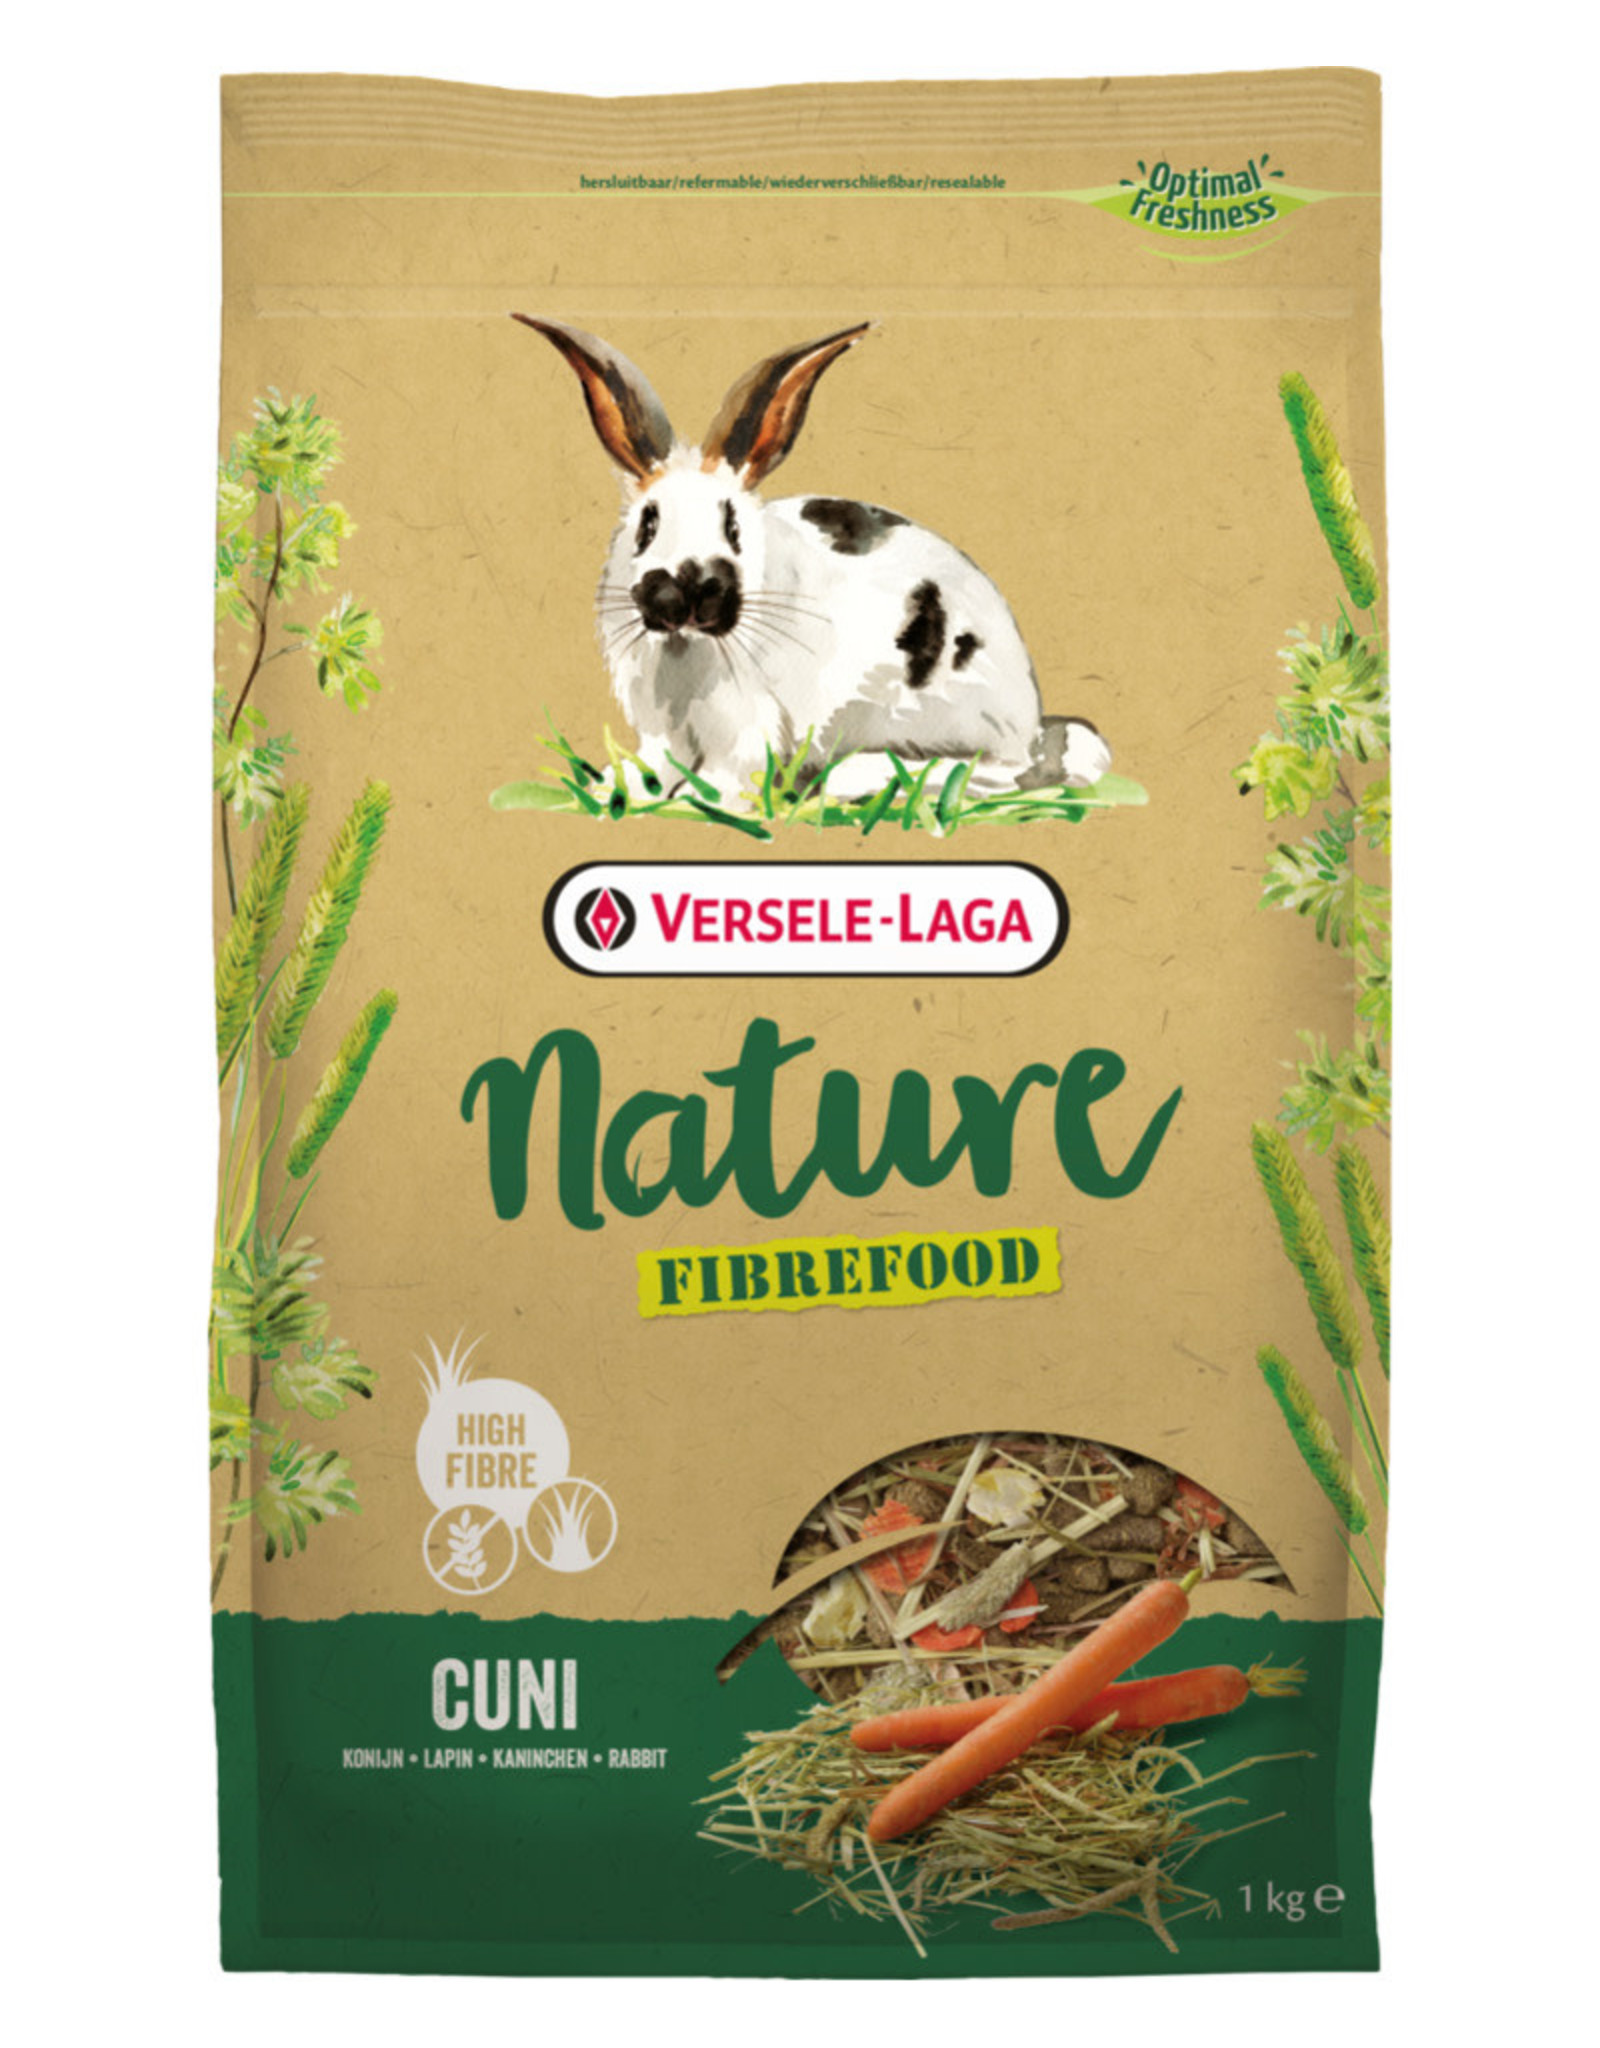 Versele-Laga Versele-Laga Nature Fibrefood Cuni 1kg